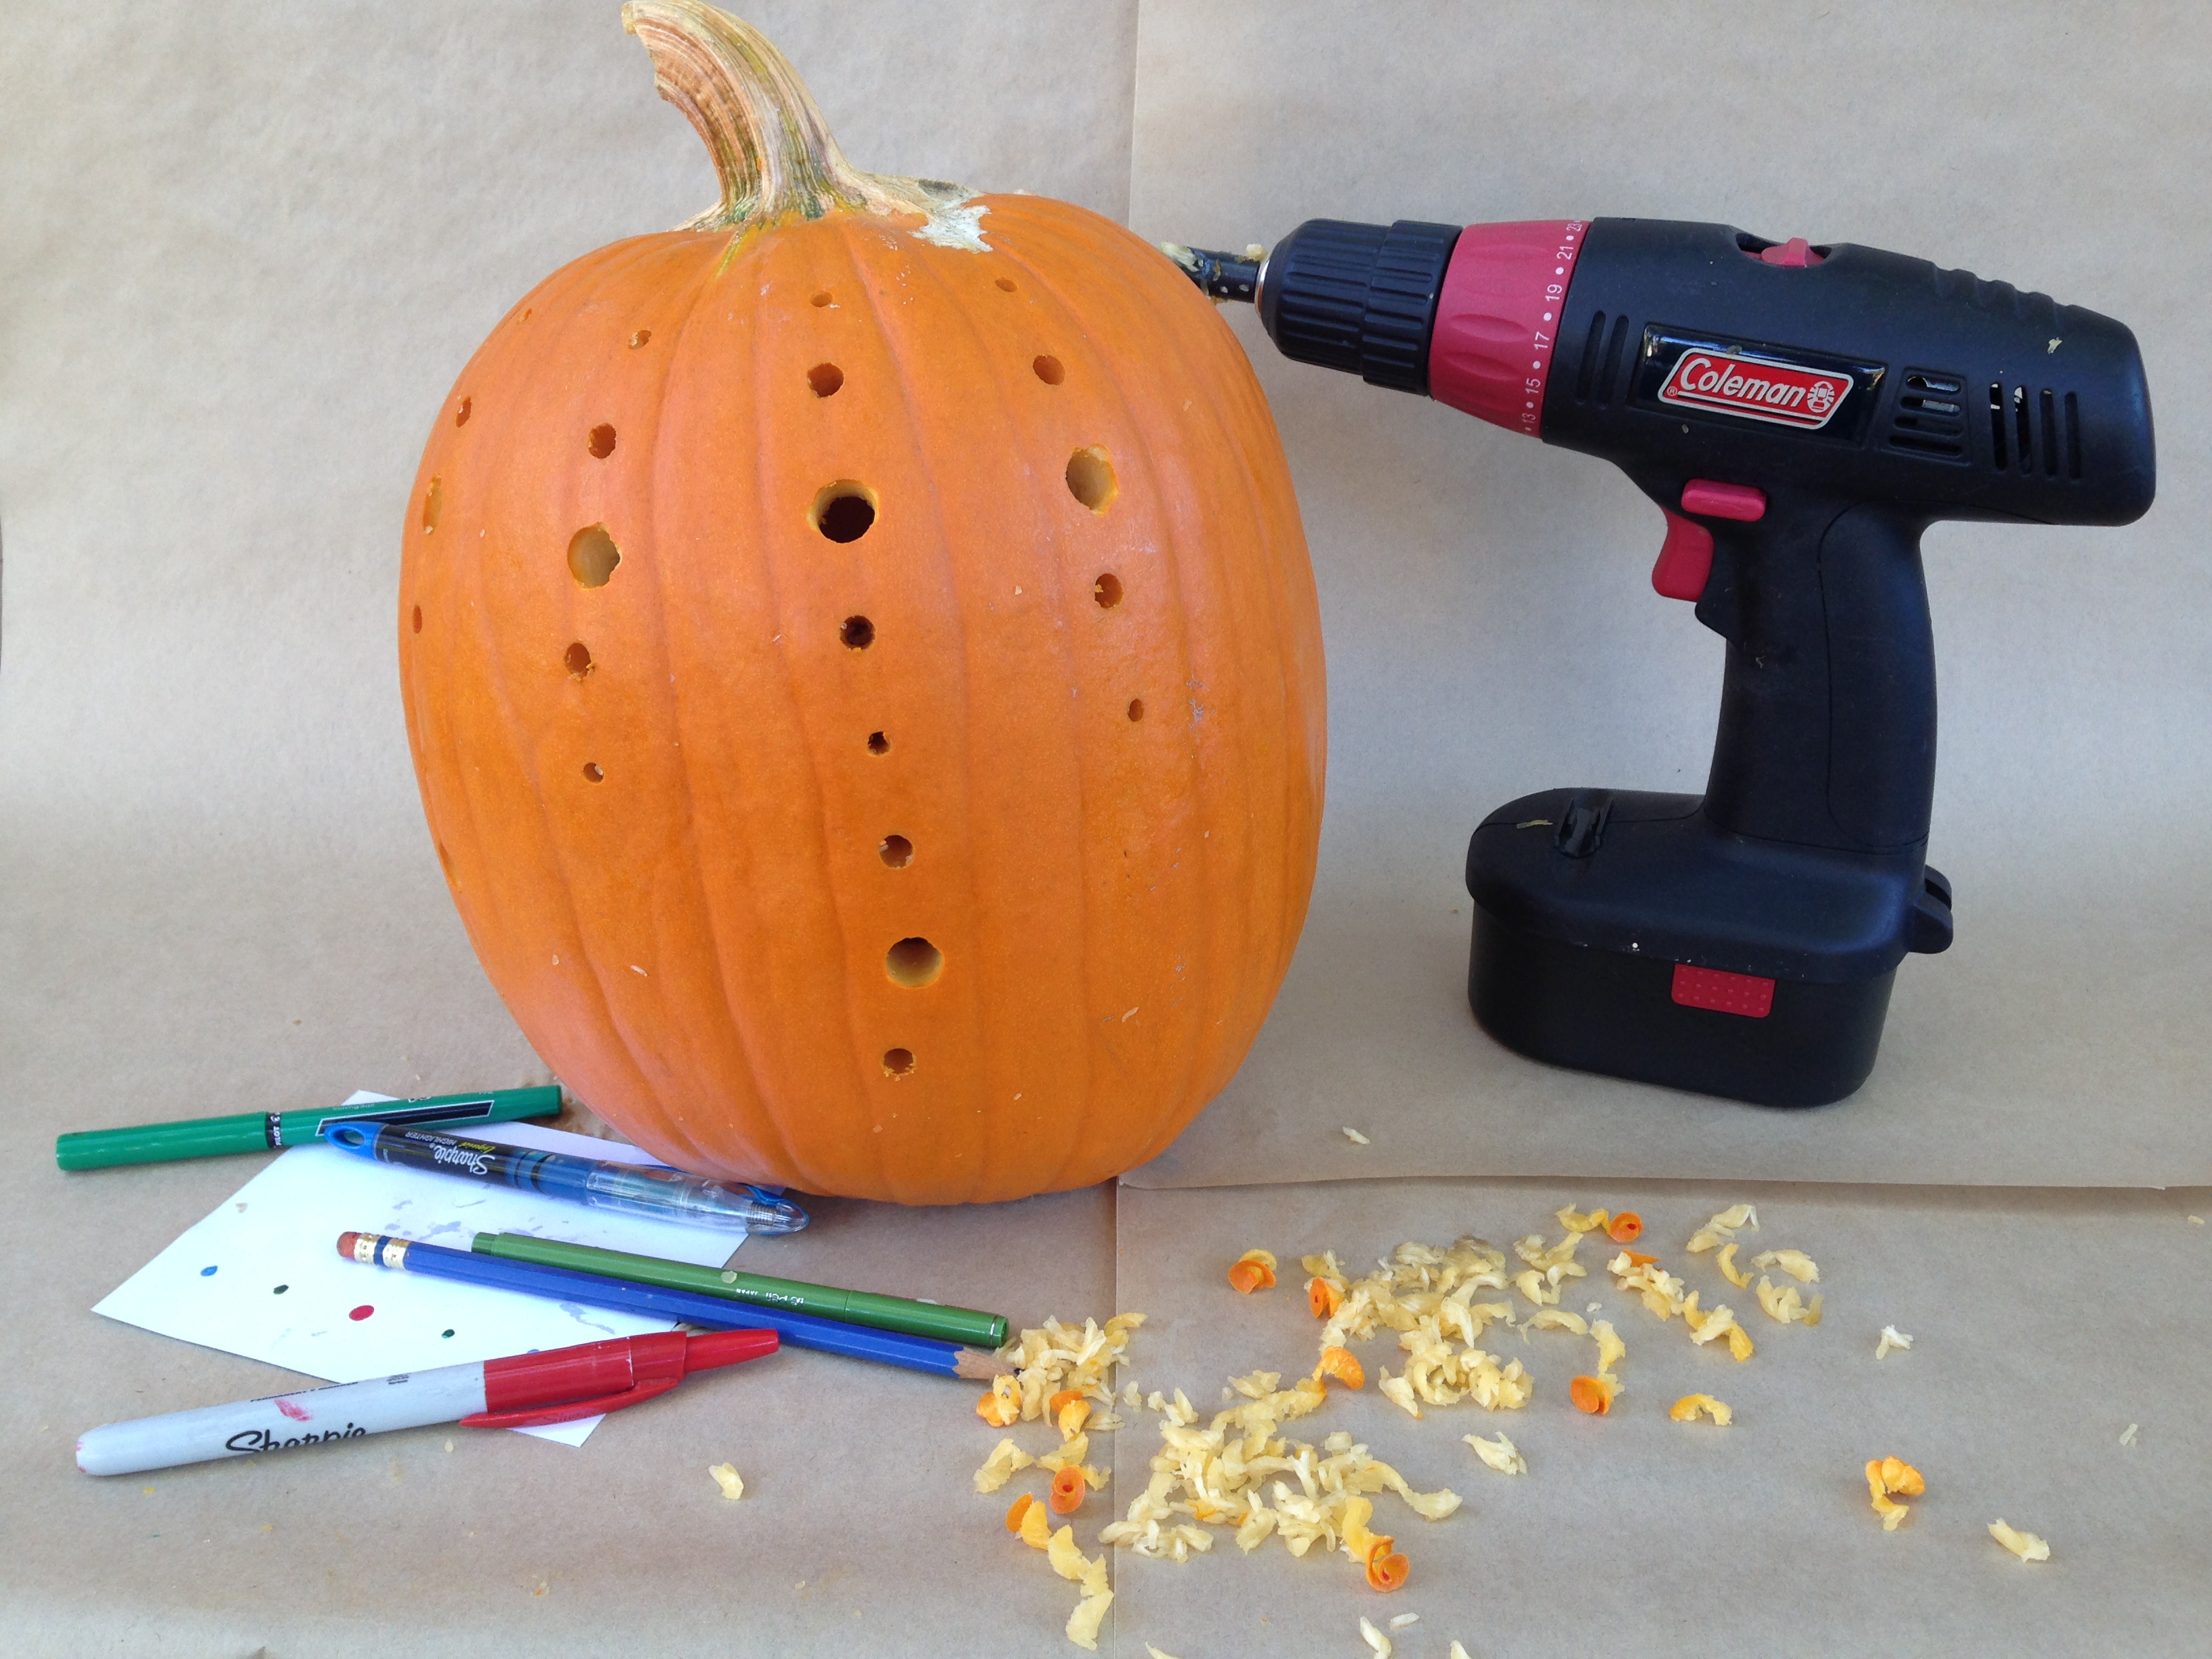 pumpkins u0026 power drills 10 creative jack o u0027 lantern ideas